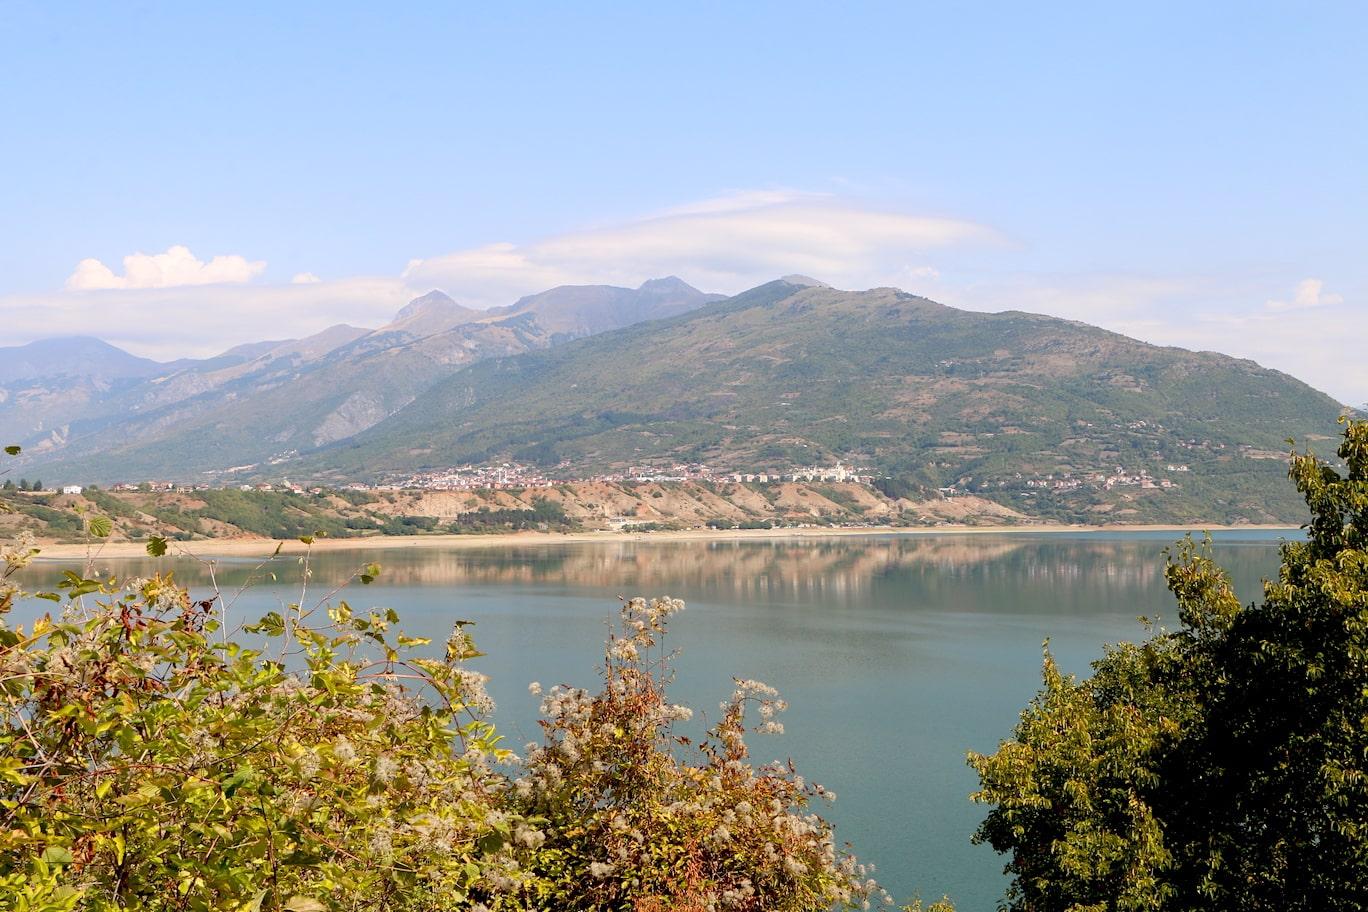 Views along the Black Drin river